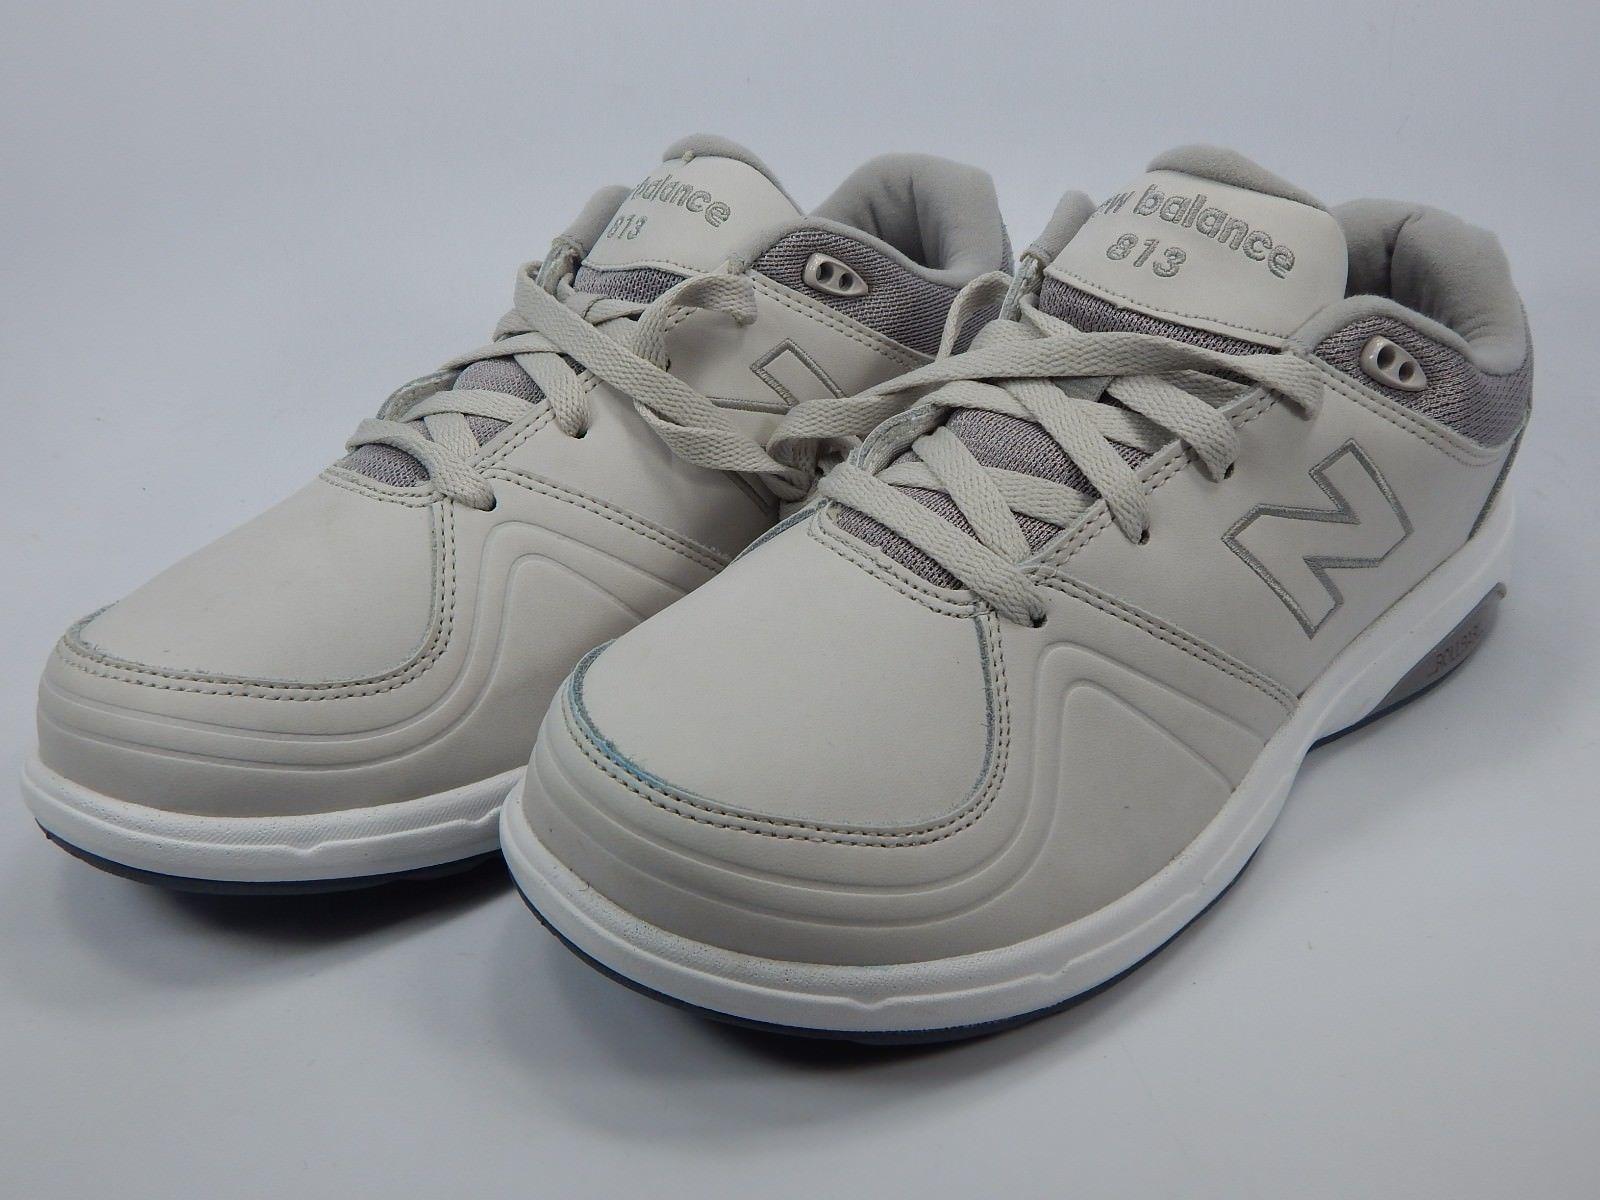 New Balance 813 Size US 9.5 D WIDE EU 41 Women's Walking Shoes Gray WW813GY1